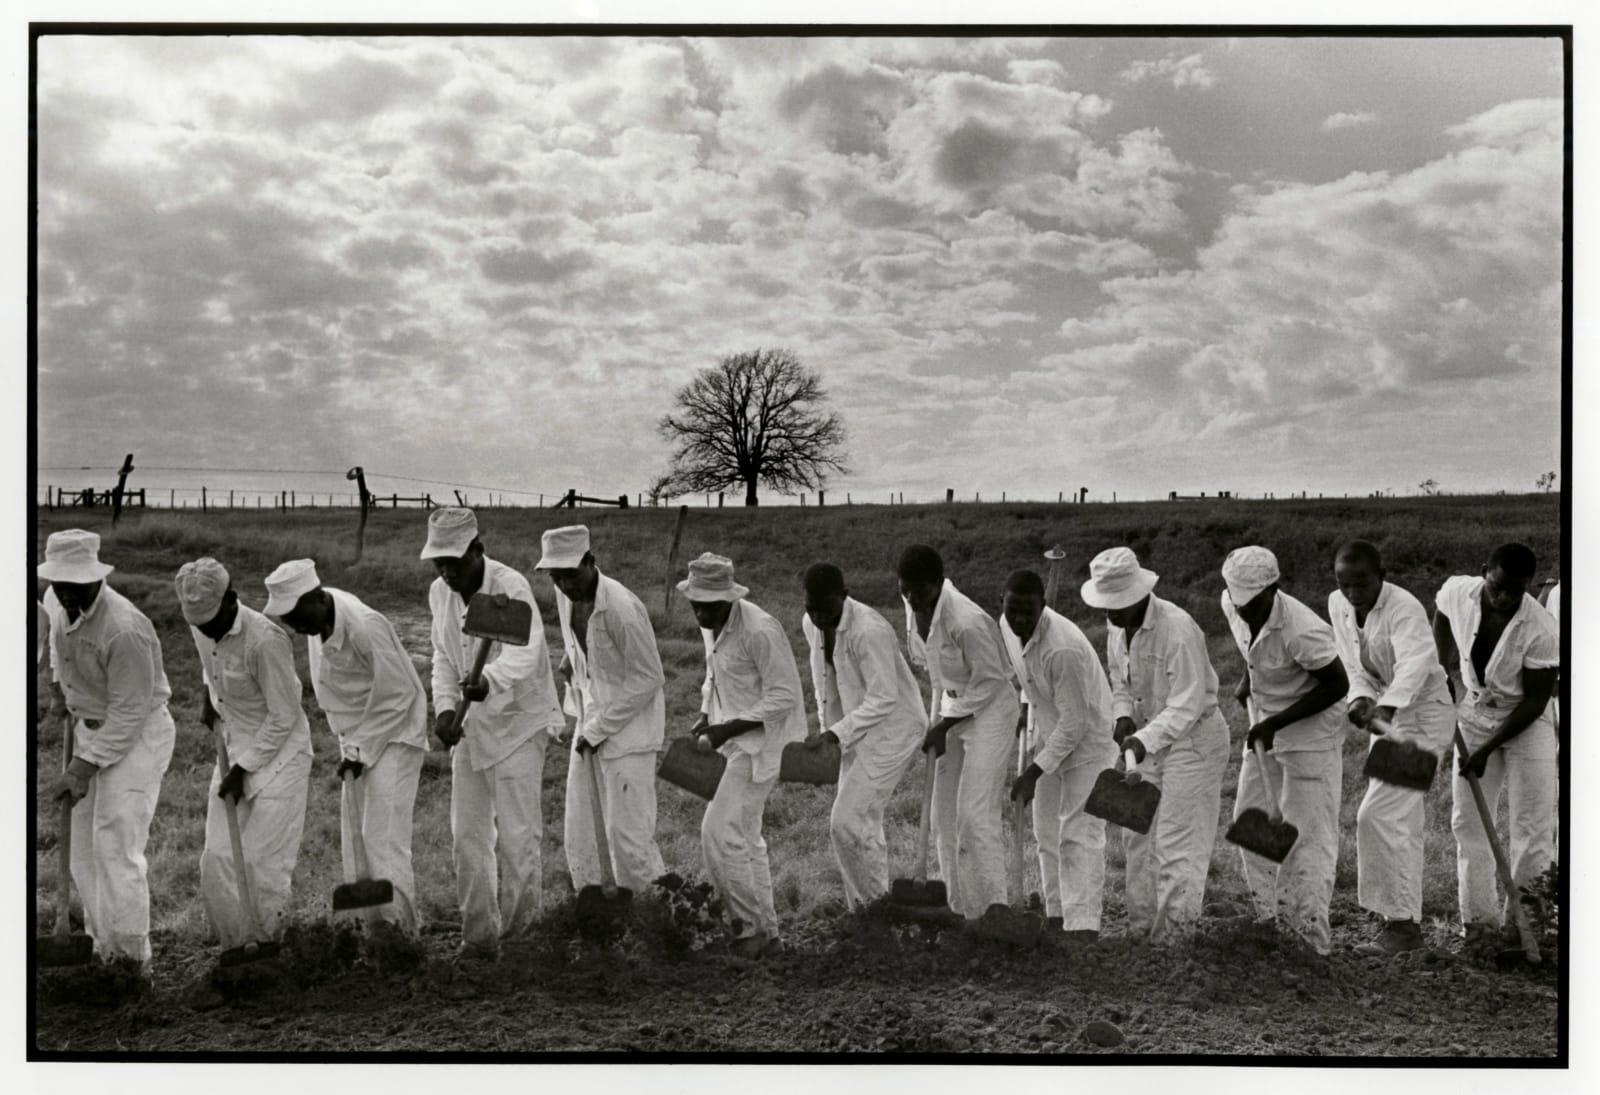 Danny Lyon - The Line, Ferguson Unit, Texas Department Of Corrections, 1968